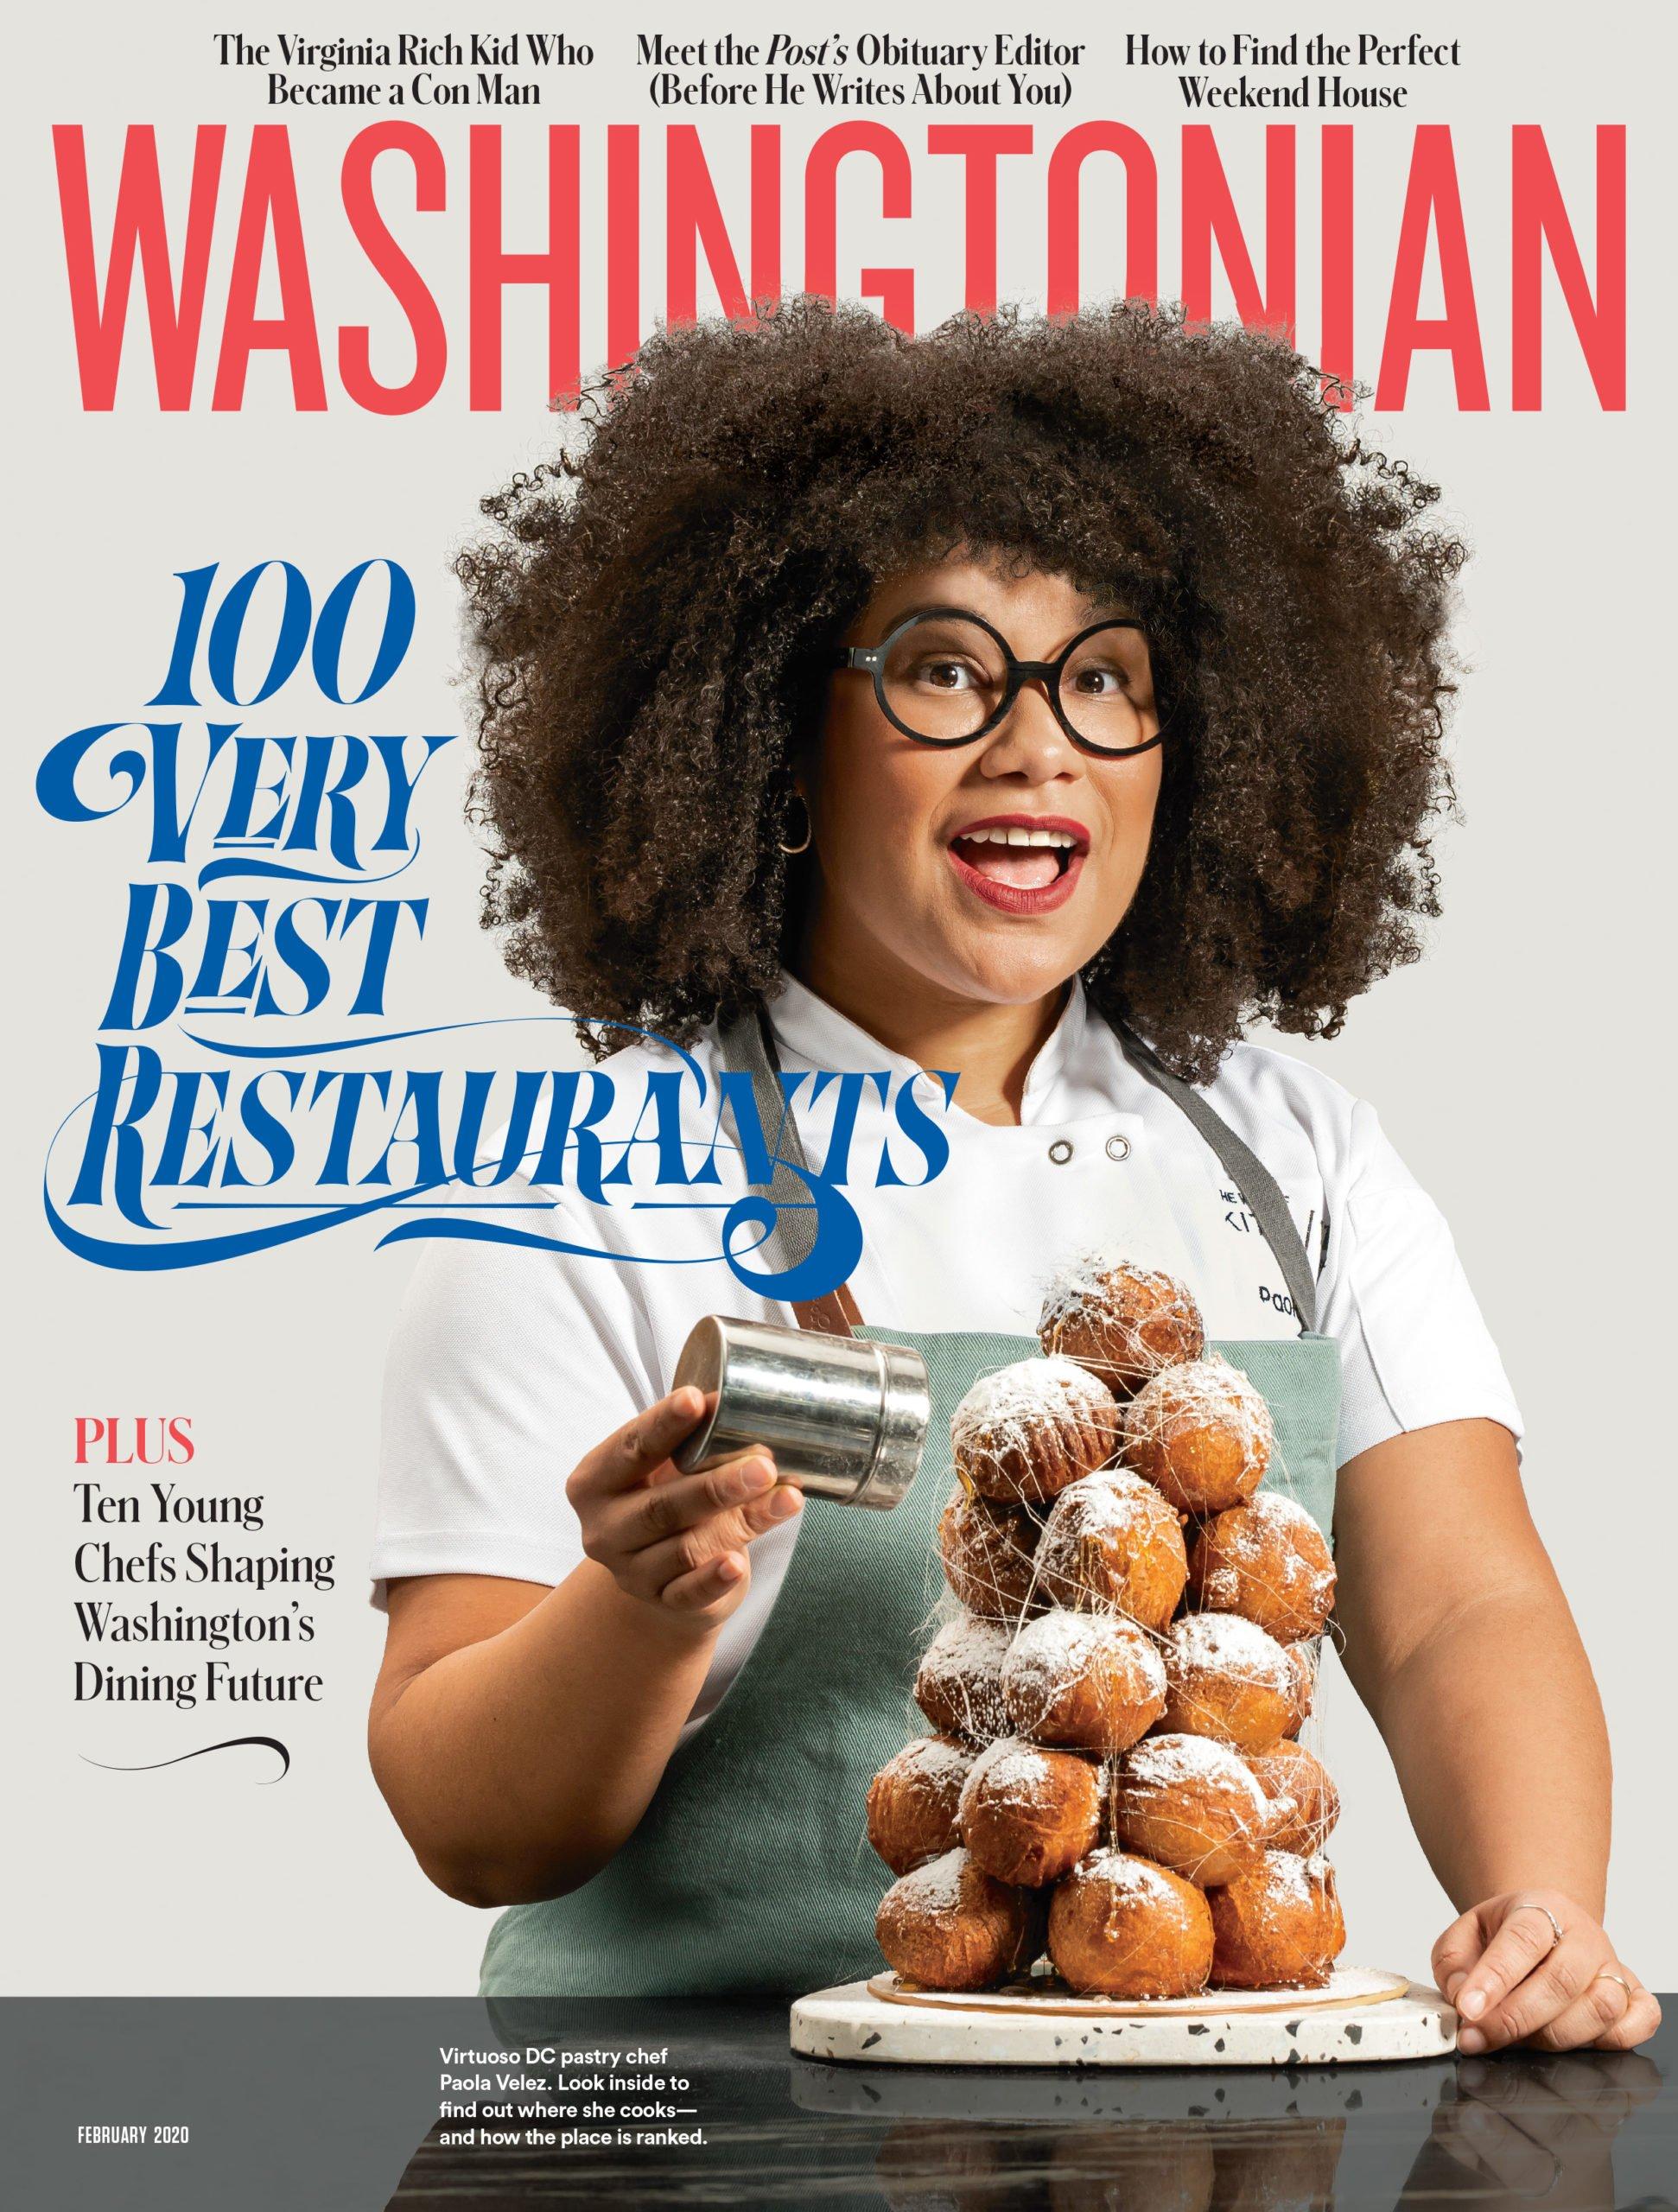 February 2020: 100 Very Best Restaurants